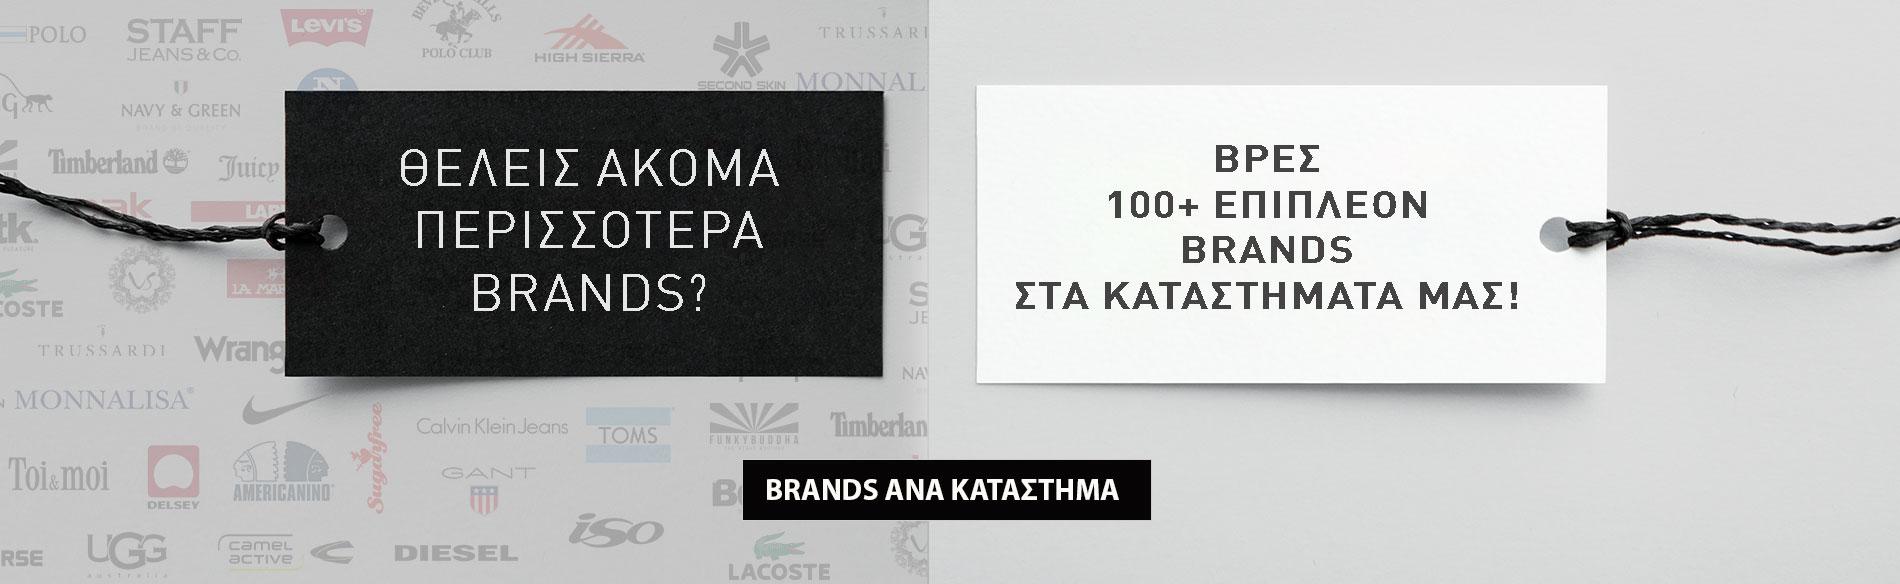 More Brands στα καταστήματα